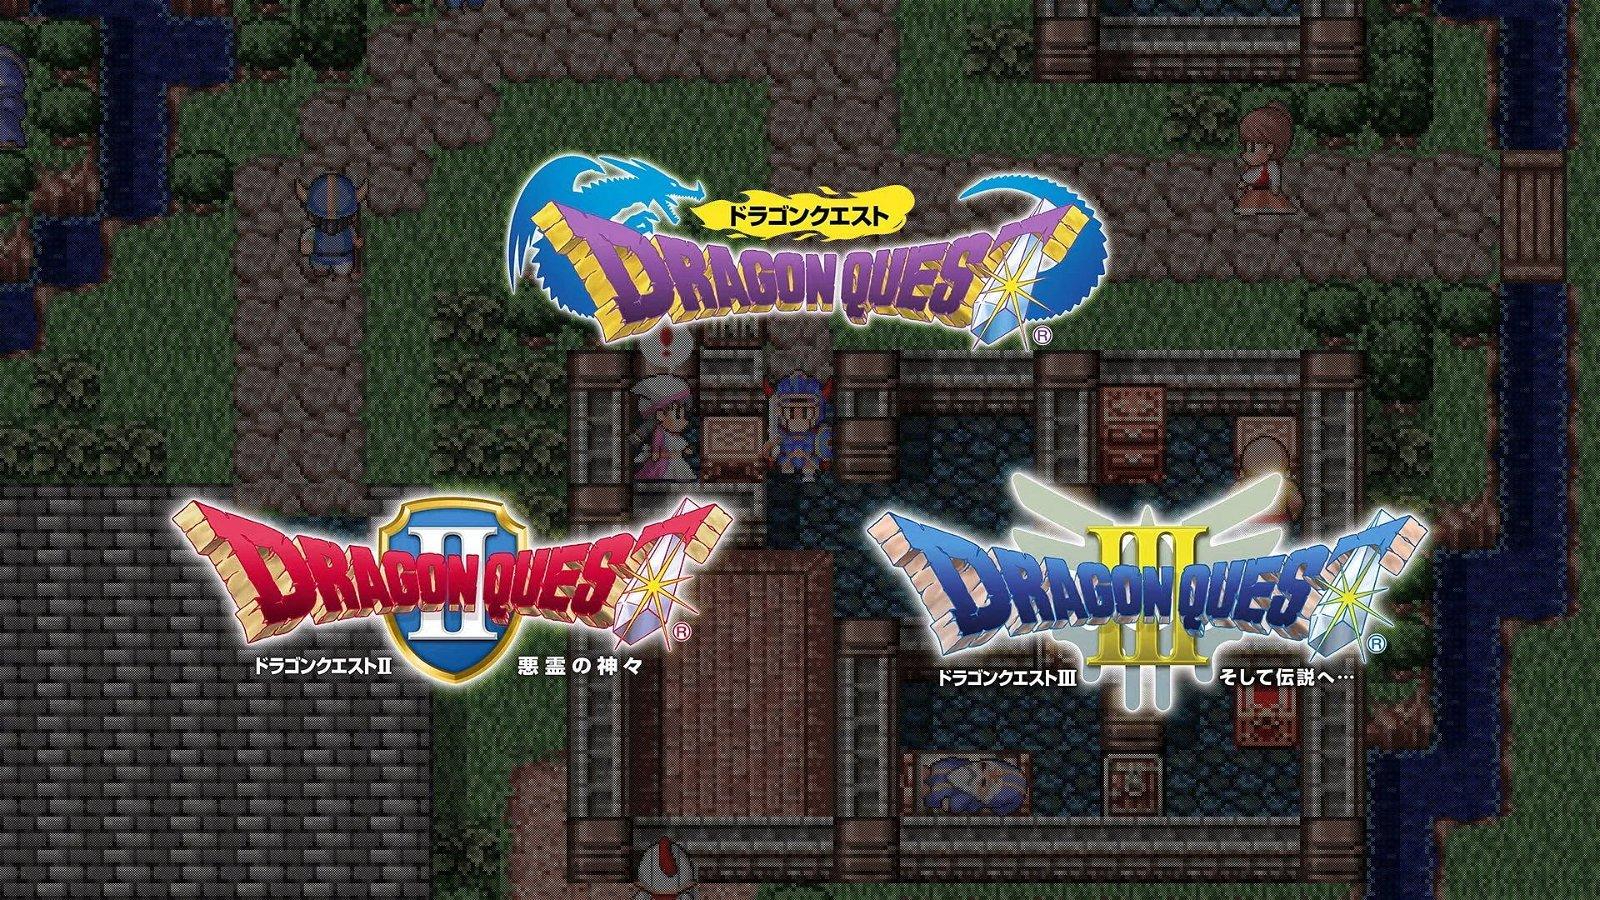 Original Dragon Quest Trilogy Coming To Nintendo Switch Next Week